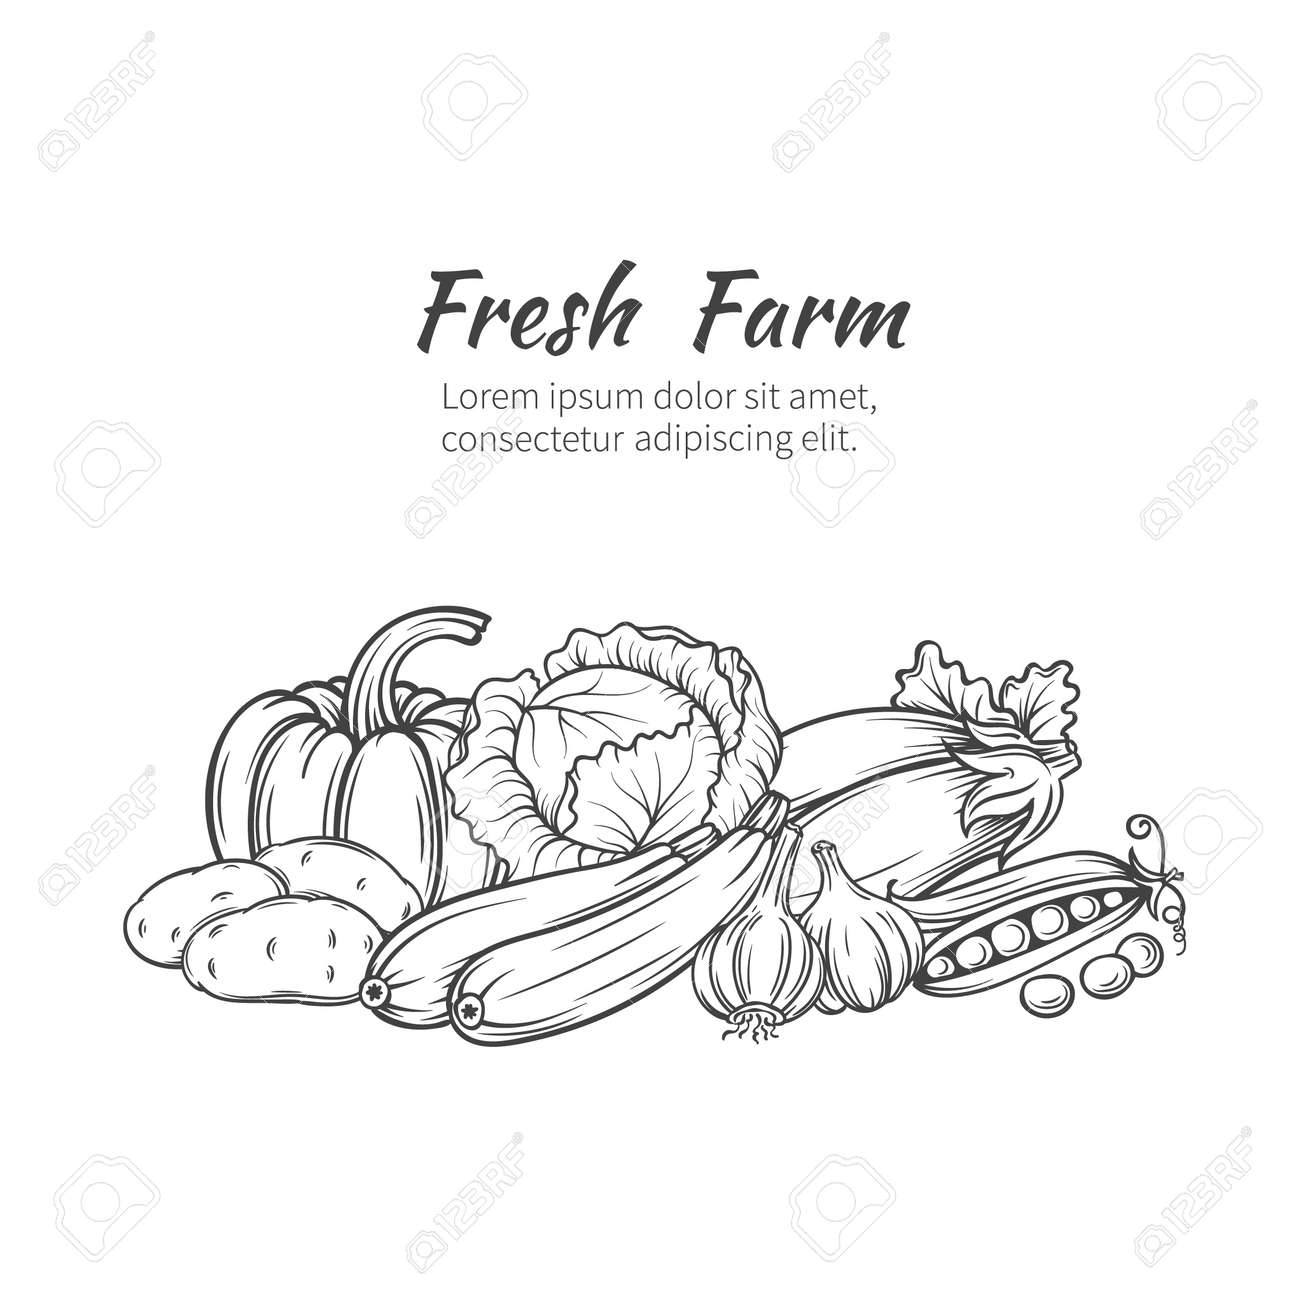 Hand drawn vegetables banner with pumpkin, potatoes, cabbage, zucchini, eggplant, garlic, peas. - 59713910